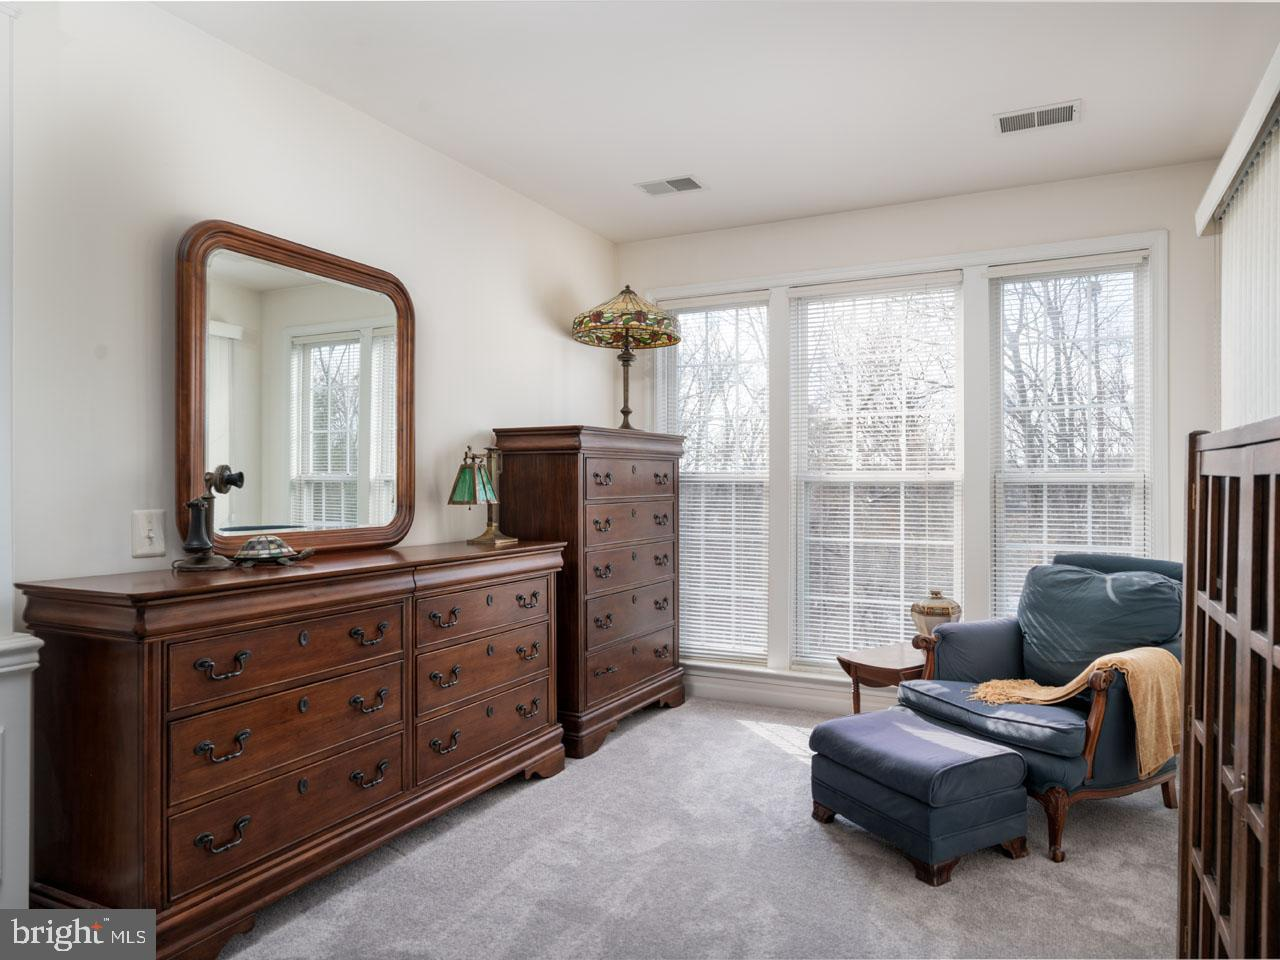 VAFX1104336-302201656845-2021-07-16-19-45-24  |   | Alexandria Delaware Real Estate For Sale | MLS# Vafx1104336  - Best of Northern Virginia